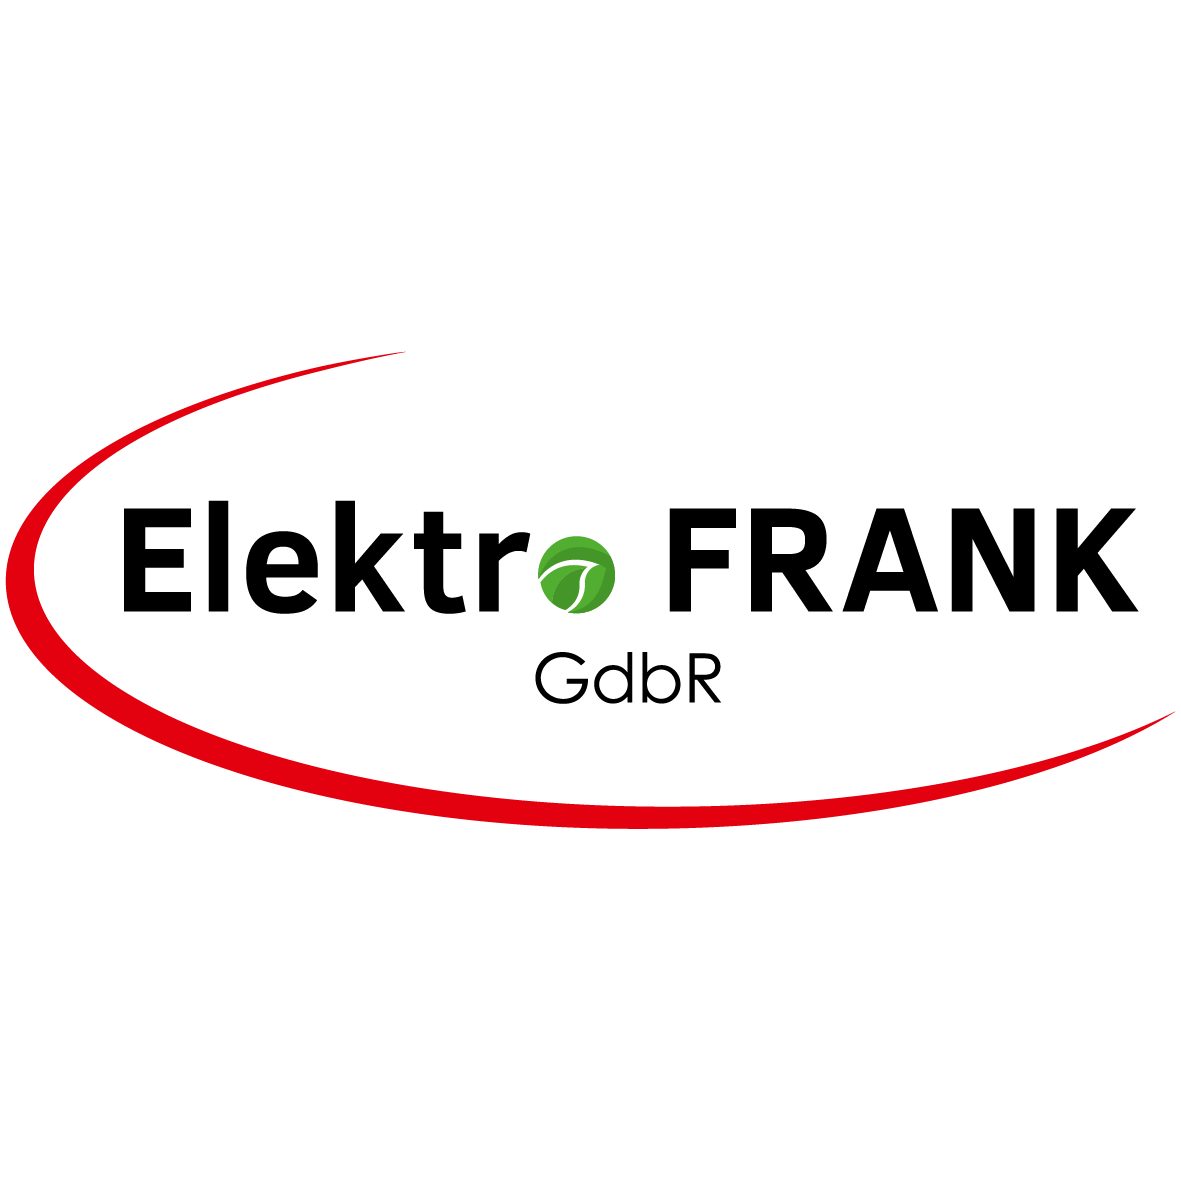 Elektro Frank GbR